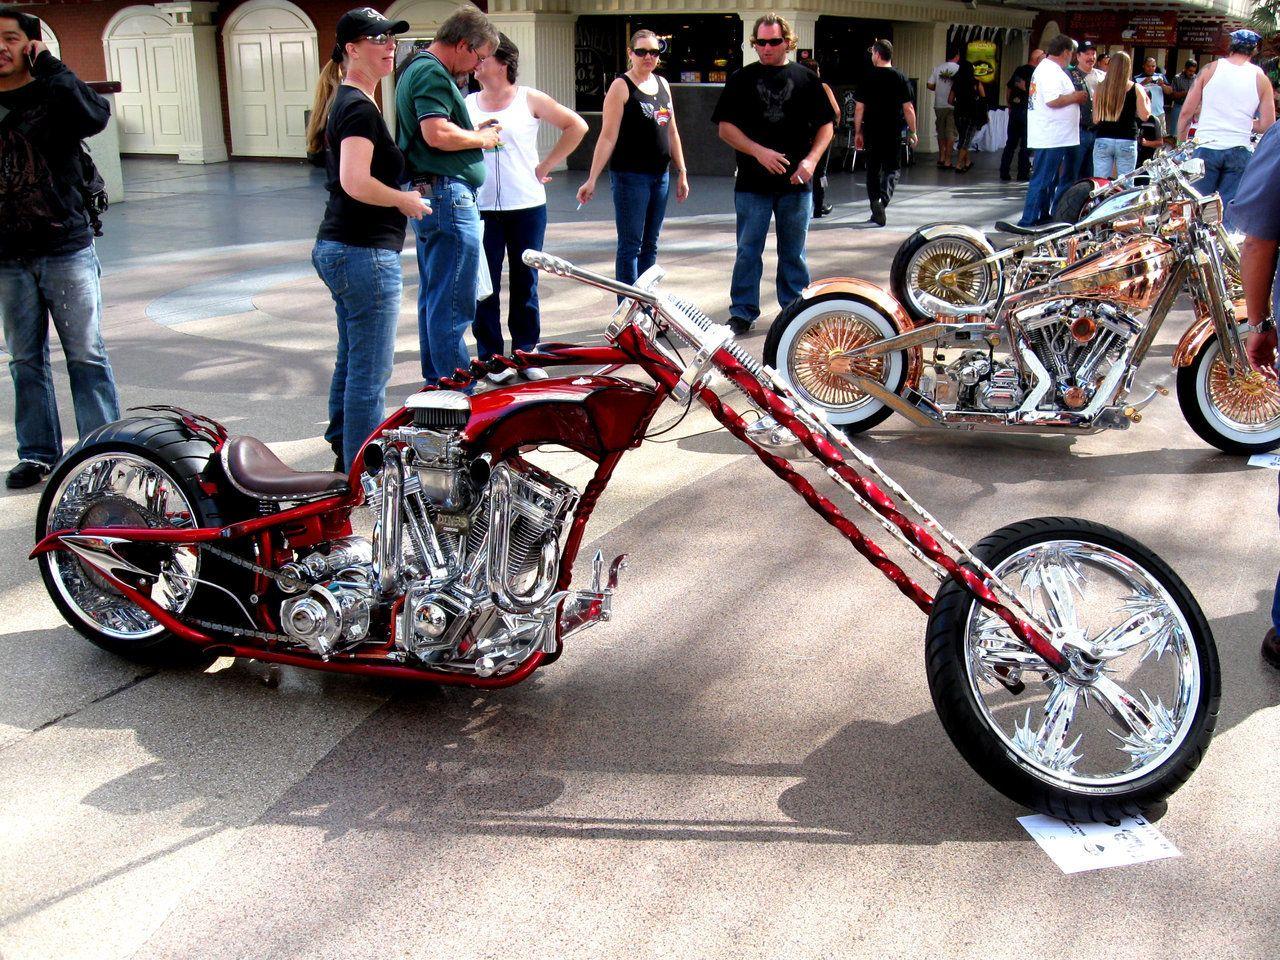 It Looks Like A Cross Between A Chopper And A Street Bike